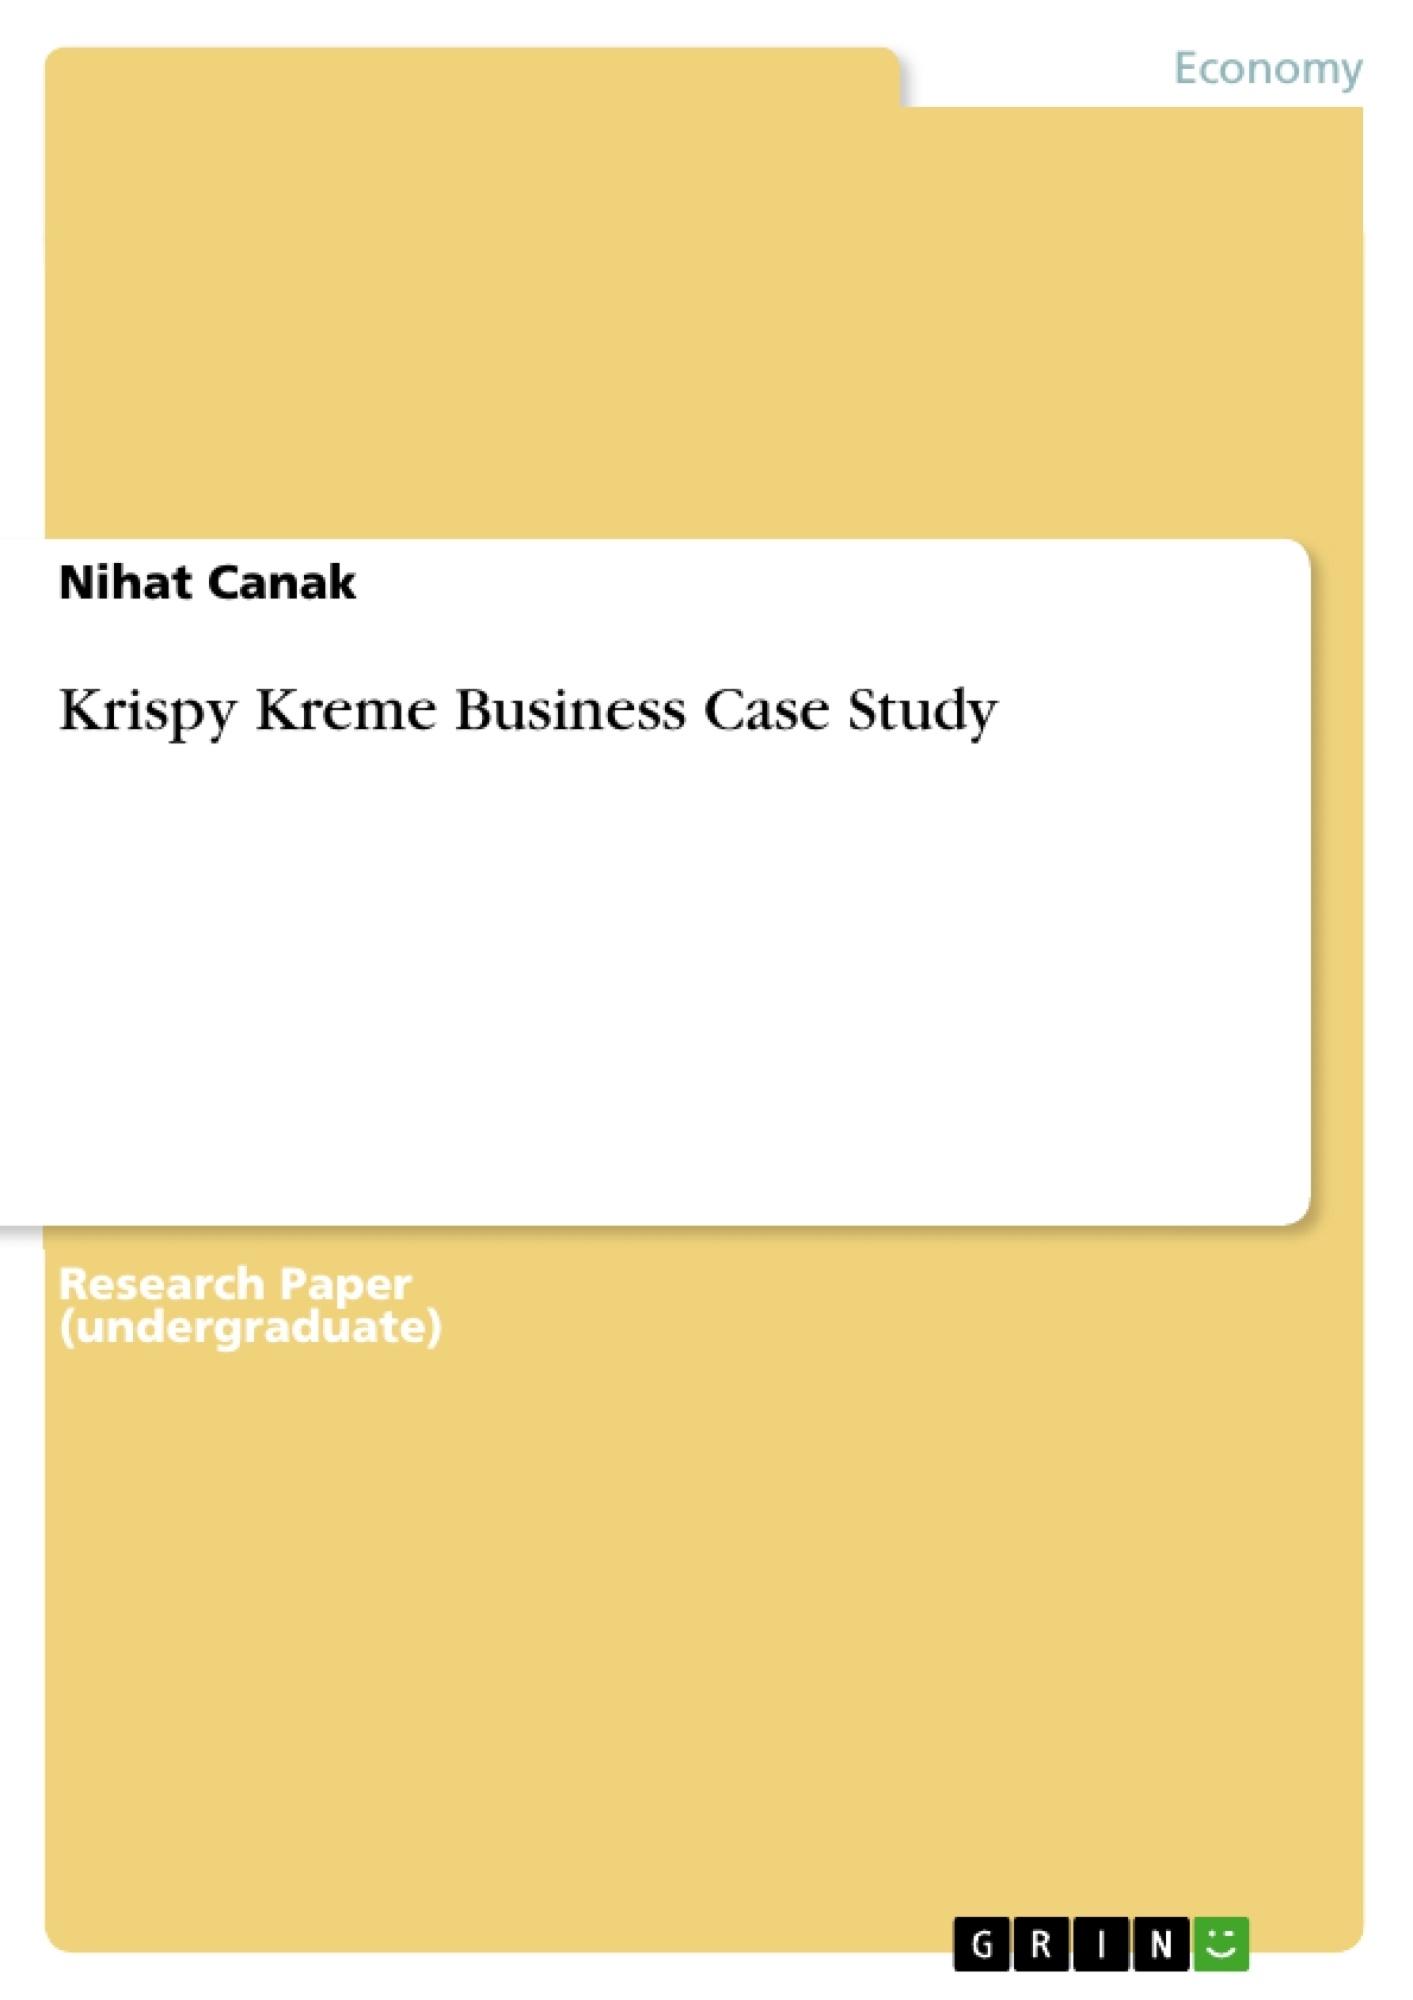 Title: Krispy Kreme Business Case Study